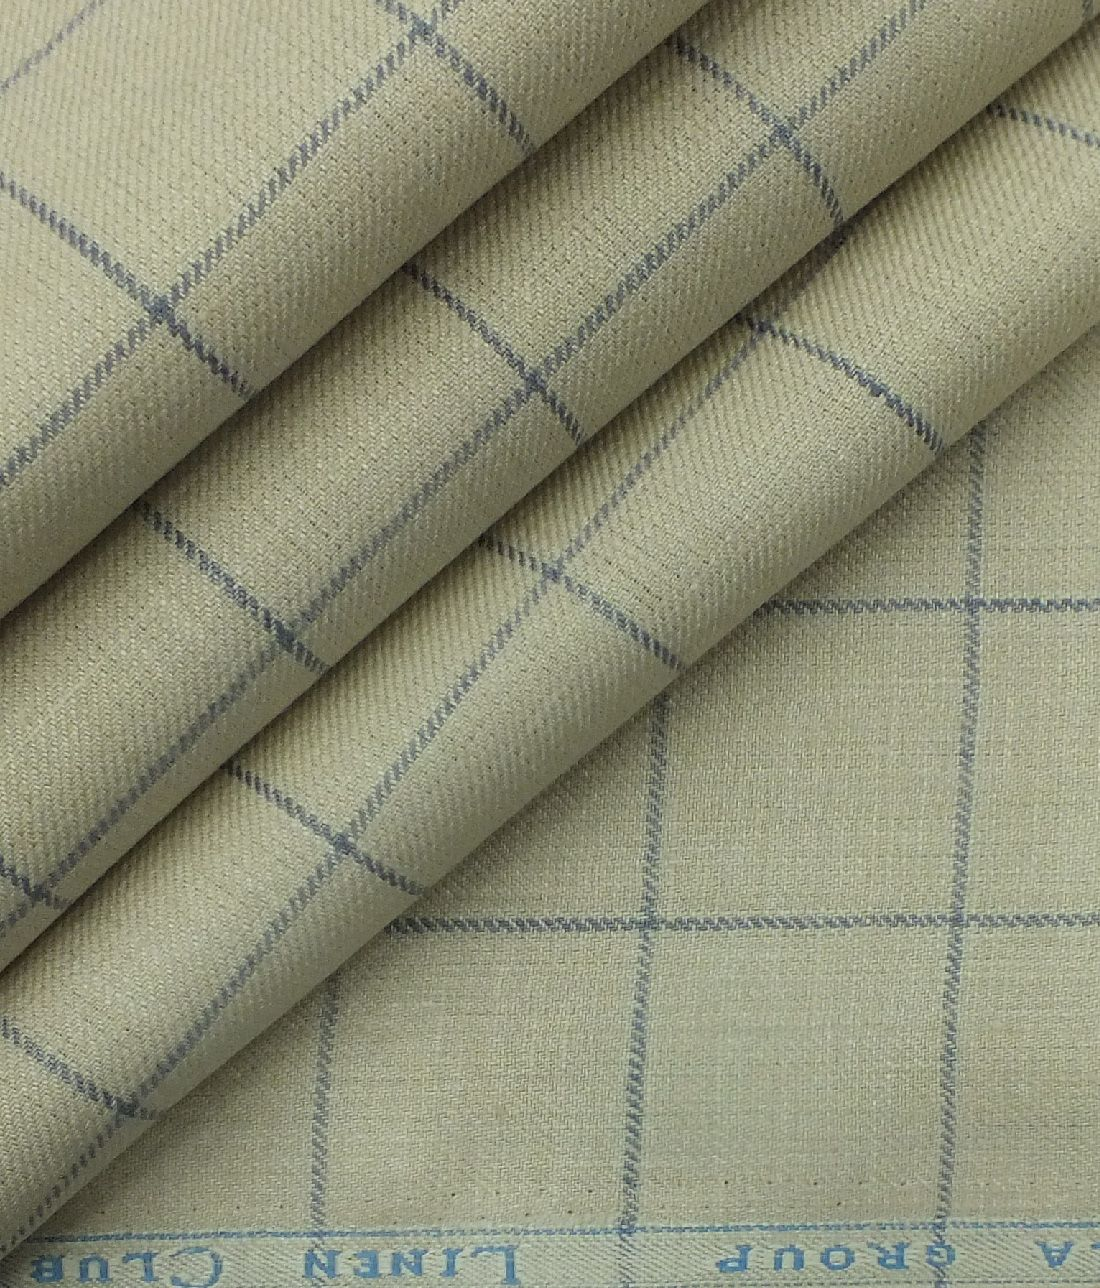 Linen Club Beige 100 Pure Linen Blue Check Trouser Fabric 1 30 M Pure Linen Linen Fabric